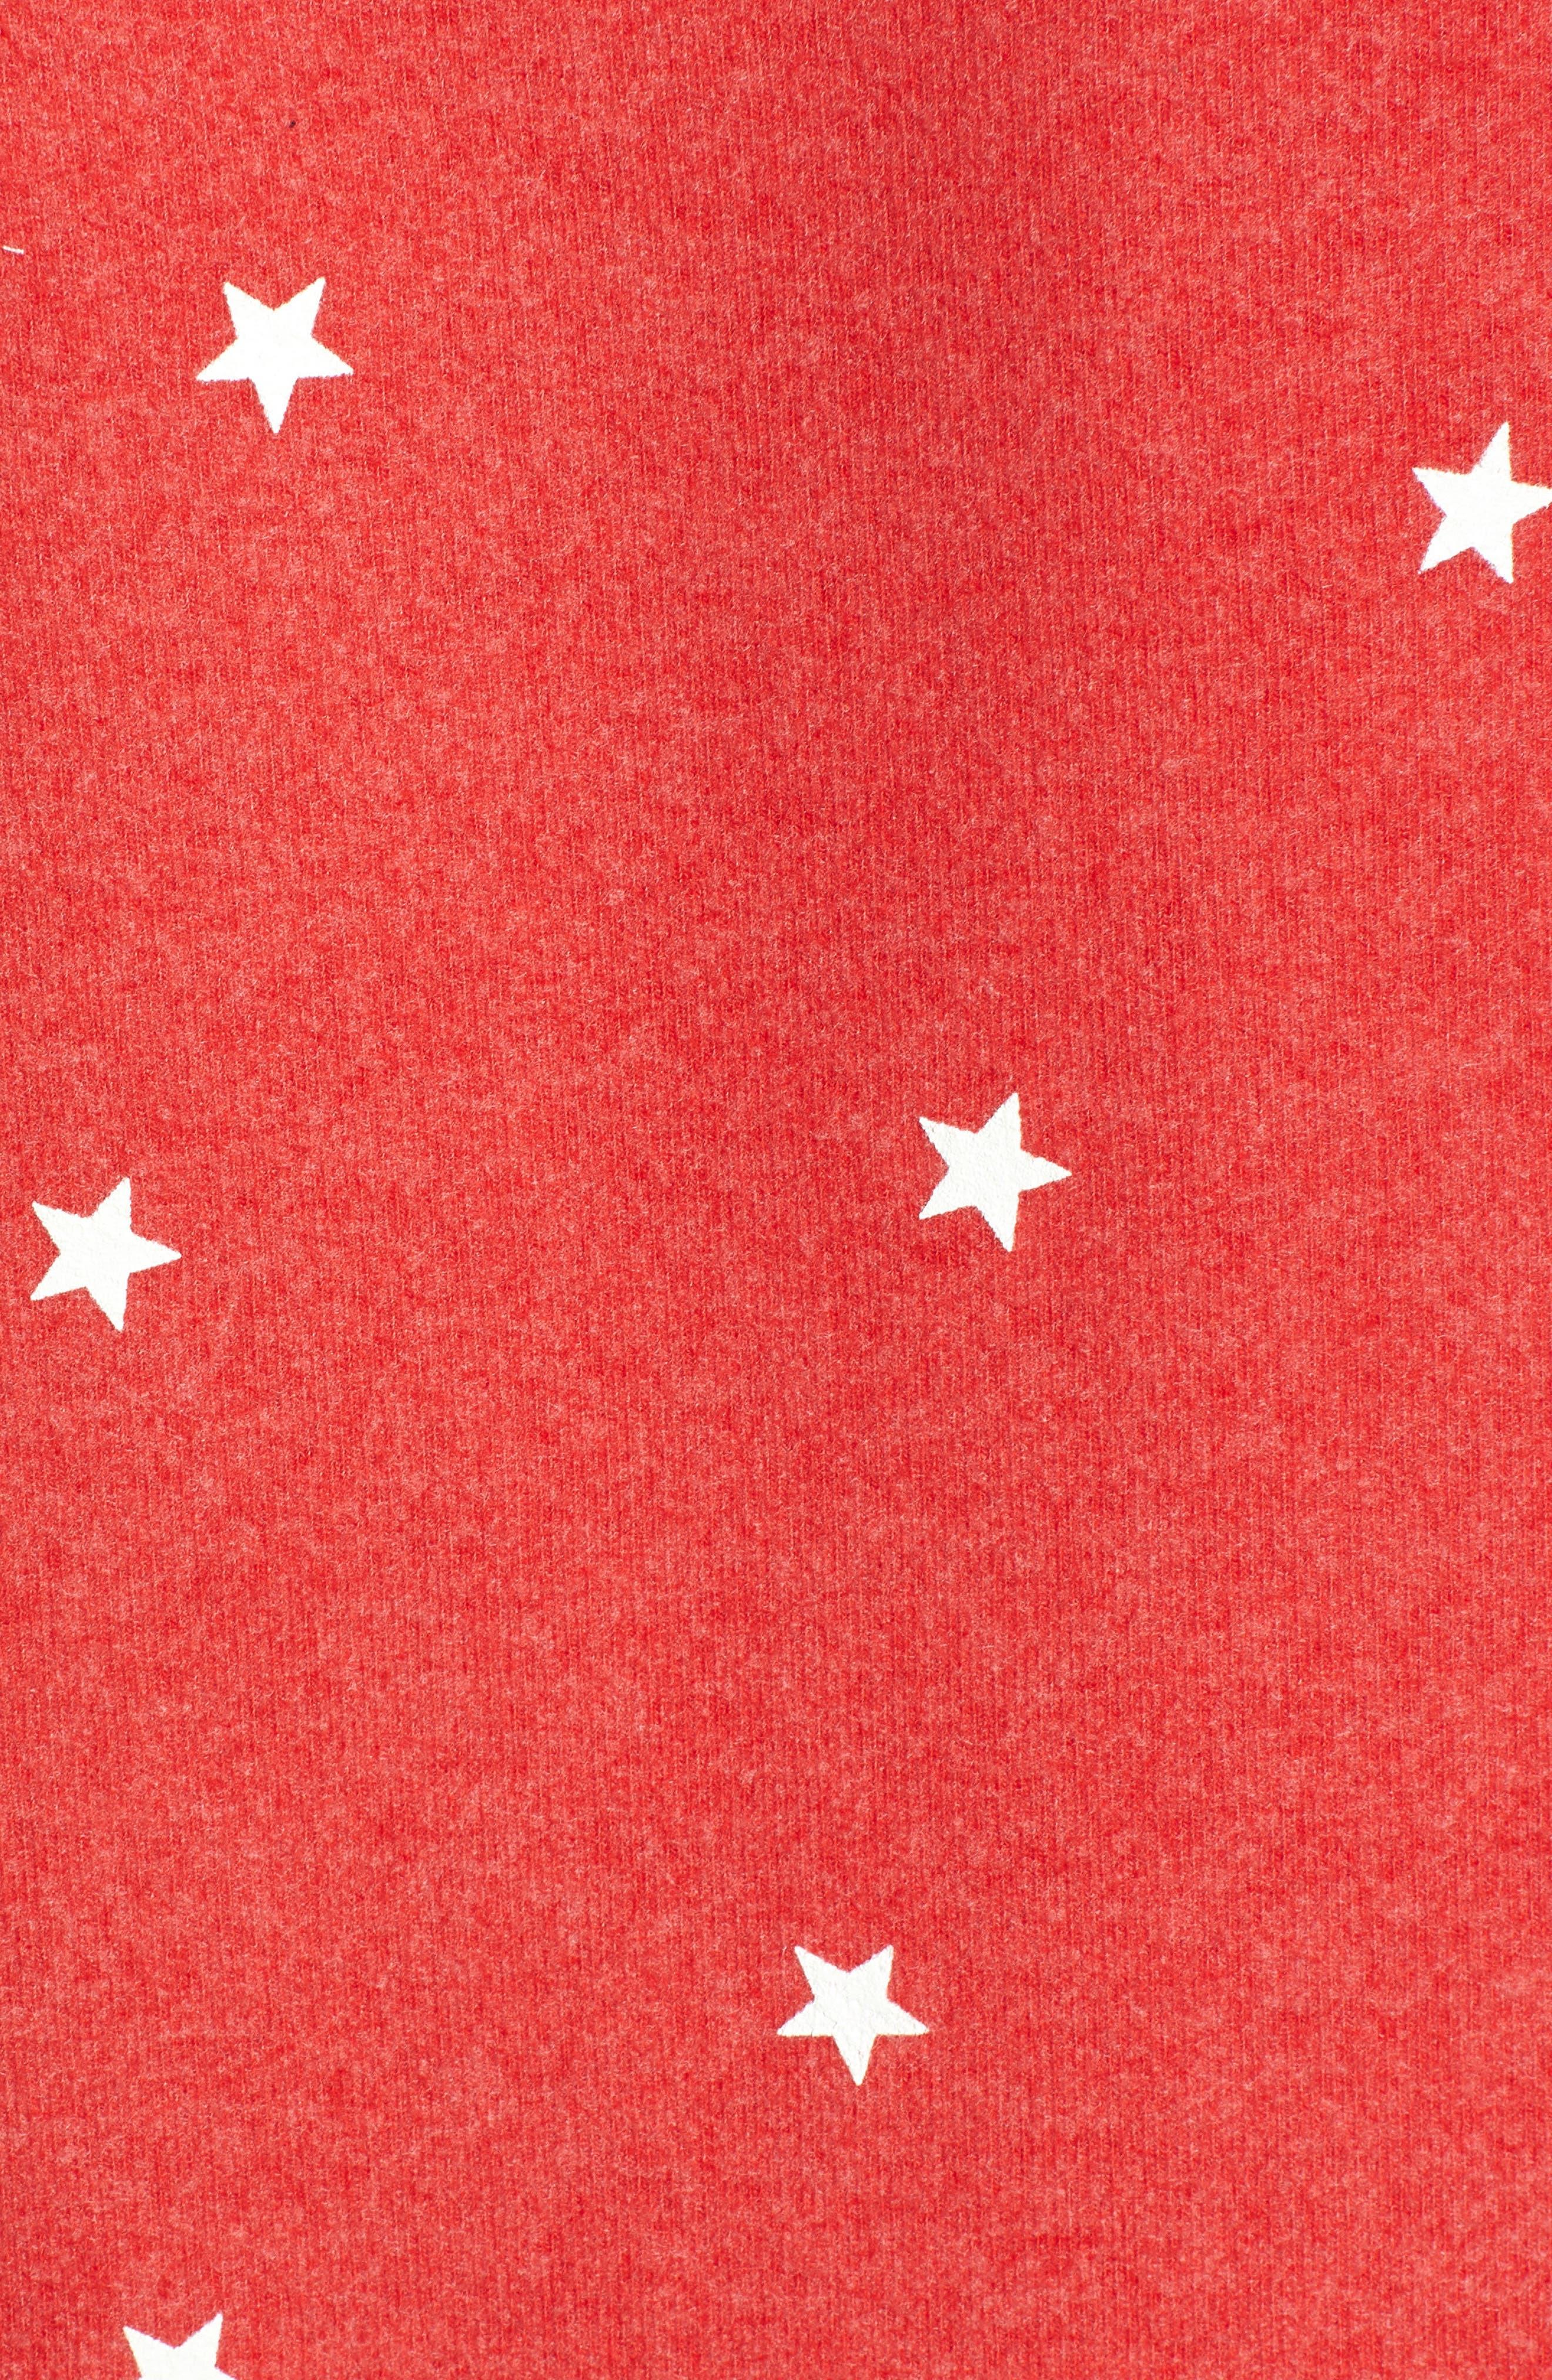 Star Baggy Beach Pullover,                             Alternate thumbnail 5, color,                             600